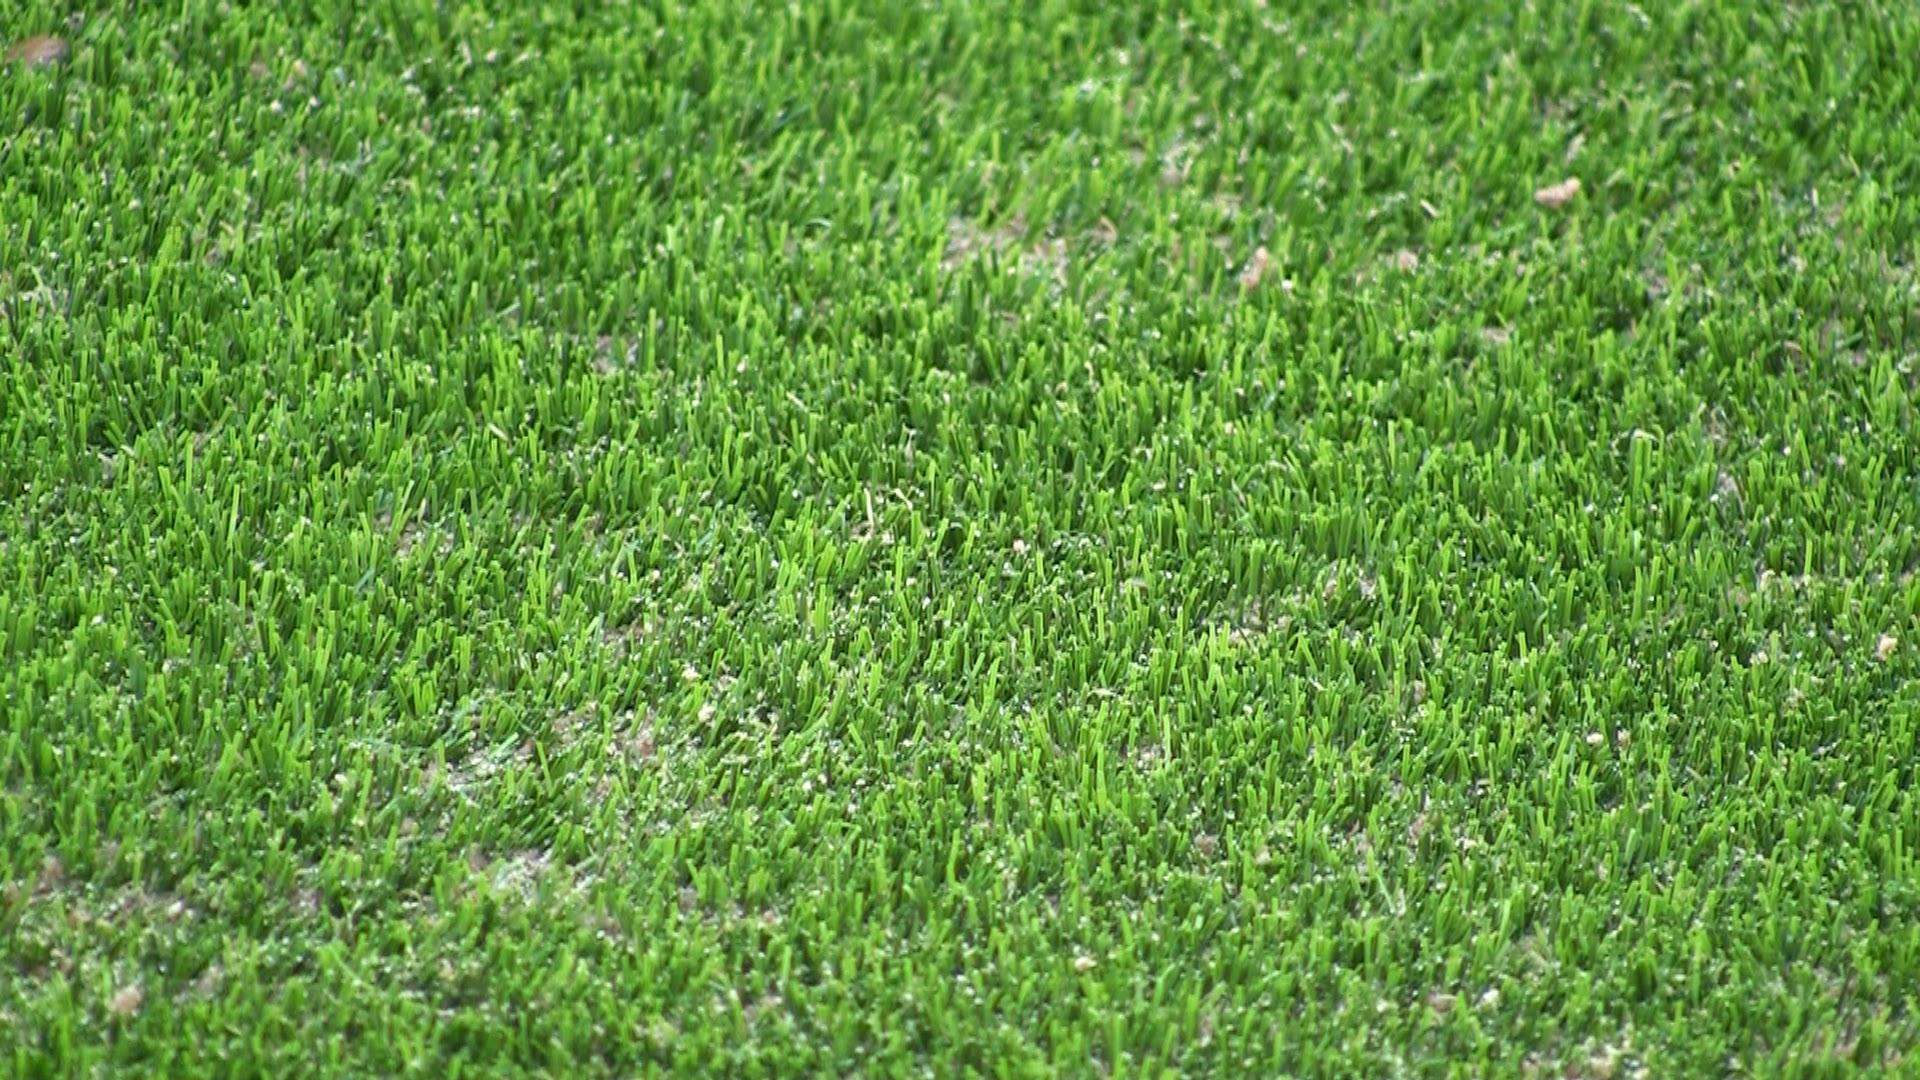 Sandyford Synthetic grass Installation